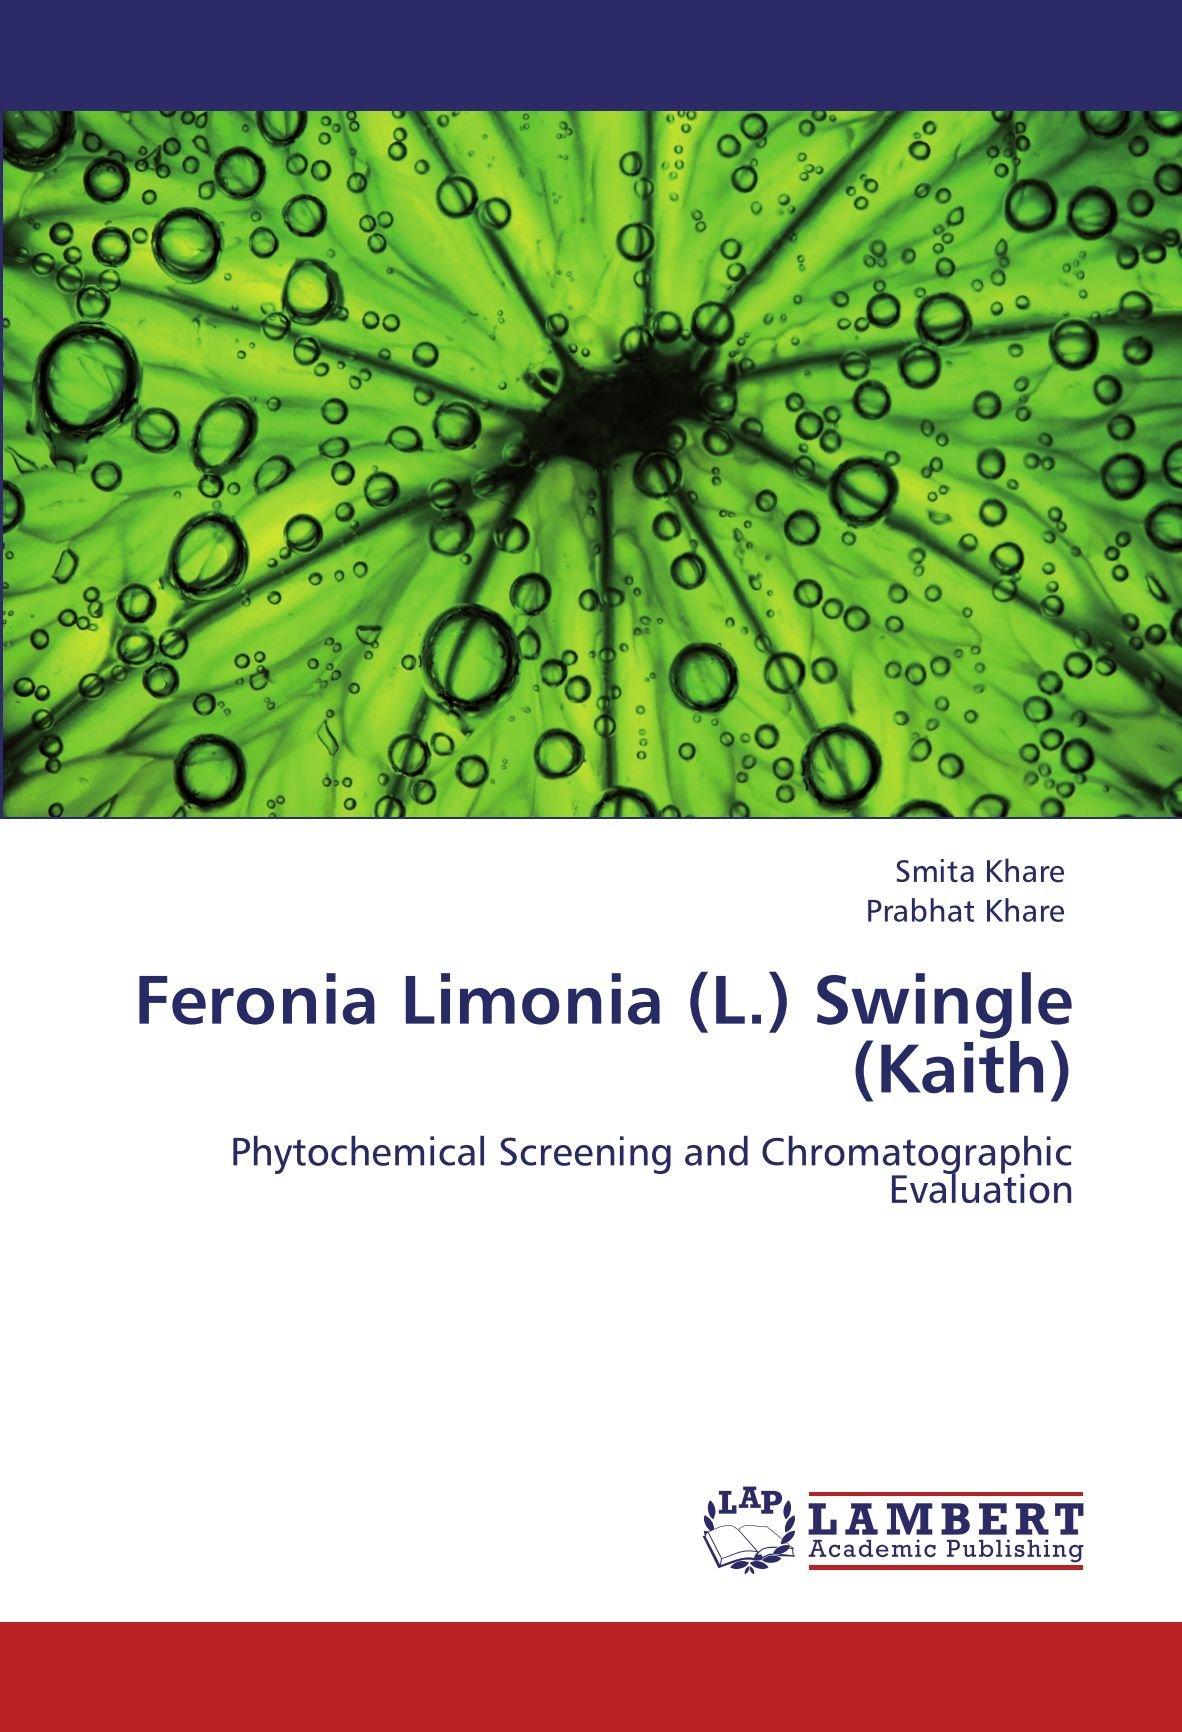 Download Feronia Limonia (L.) Swingle (Kaith): Phytochemical Screening and Chromatographic Evaluation pdf epub